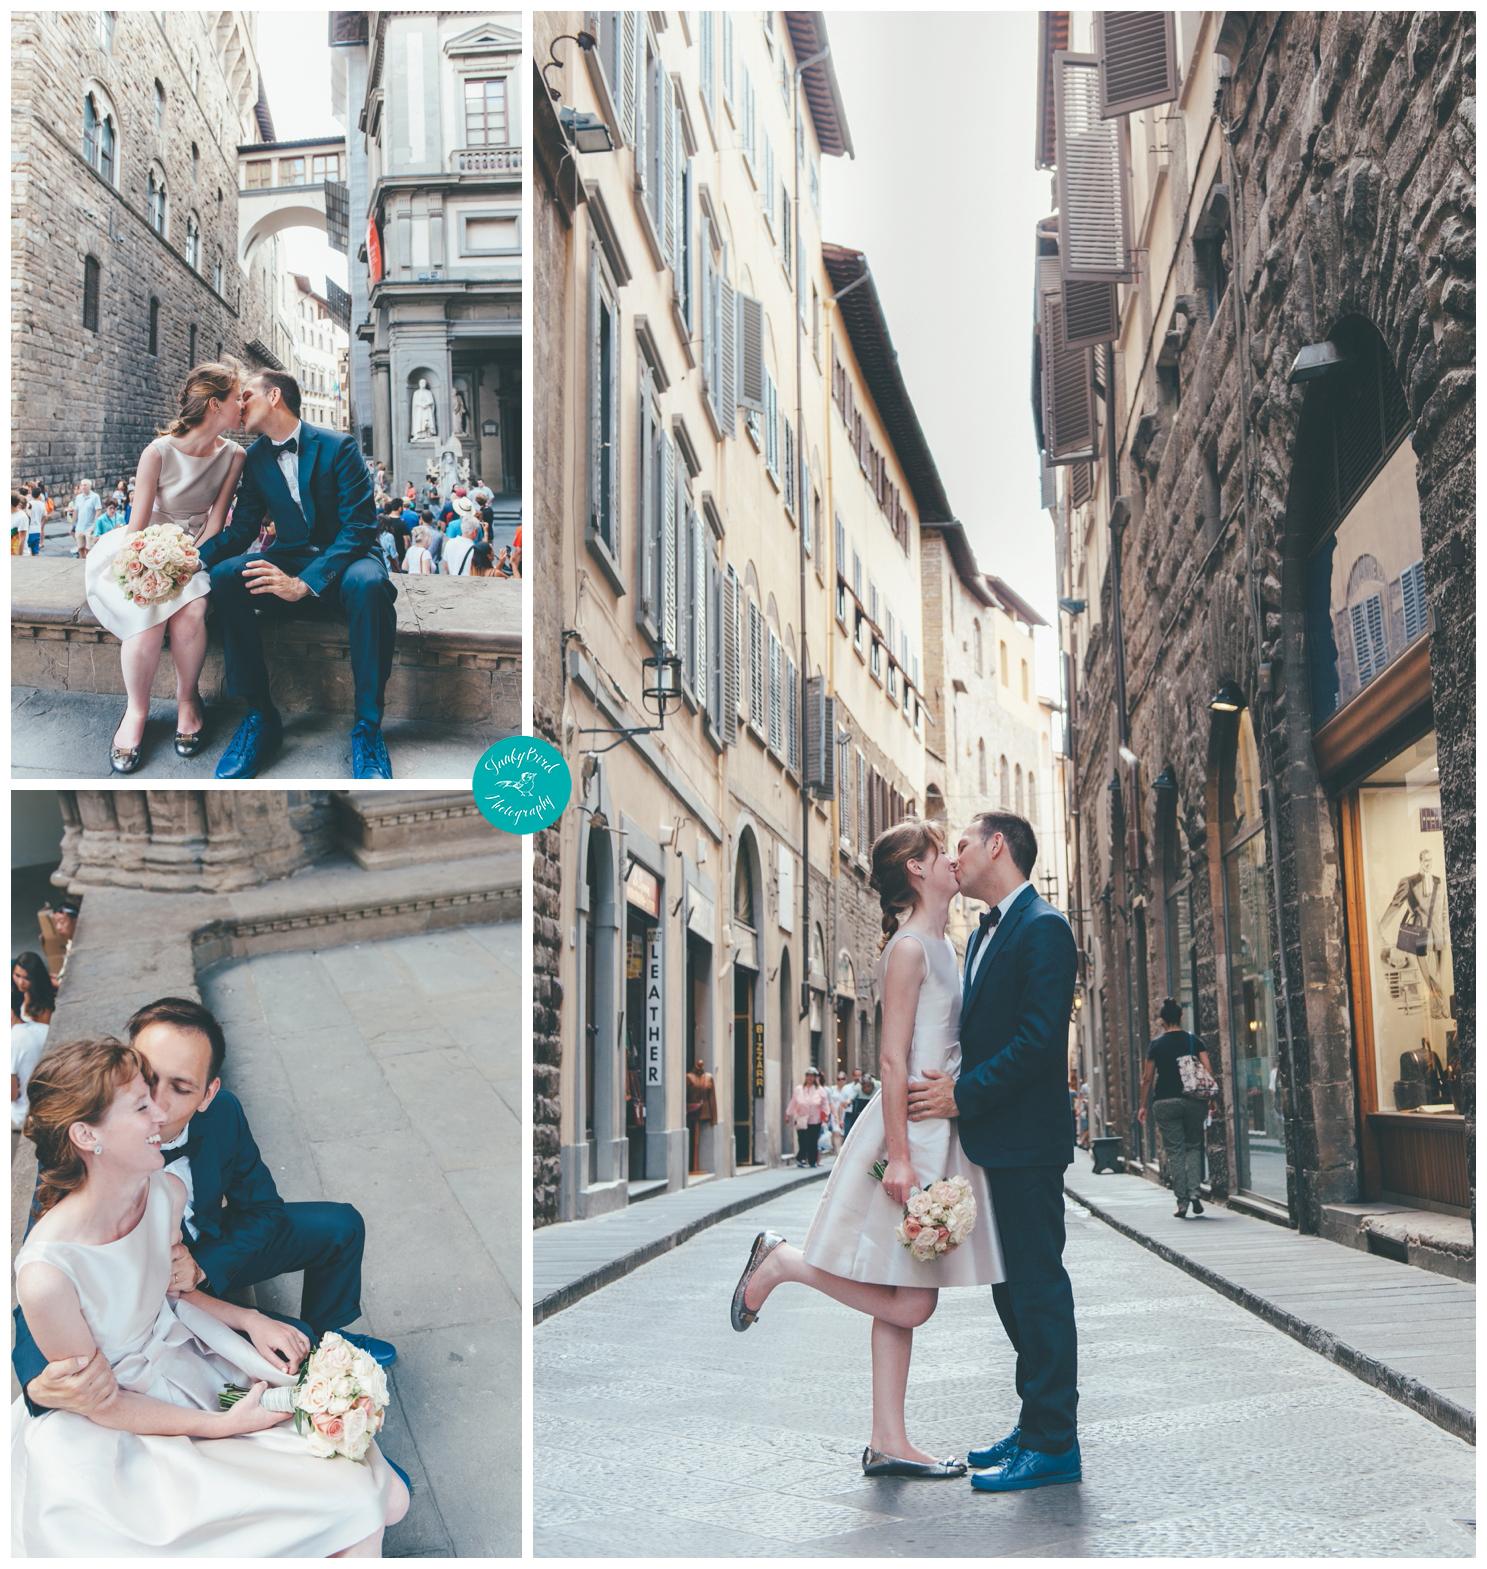 FunkyBird Photography Wedding Photographer in Tuscany  #destinationwedding #weddinginitaly #weddinginflorence #weddingphotographerintuscany #smallwedding #funkybirdweddingdesign #funkybirdphotography